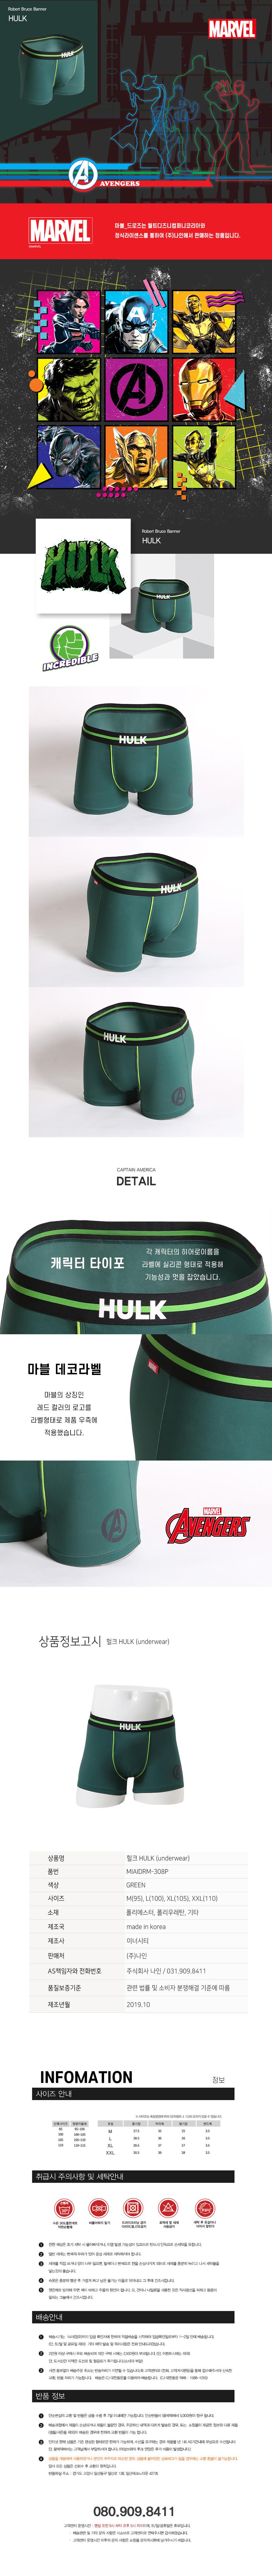 2_hulk.jpg